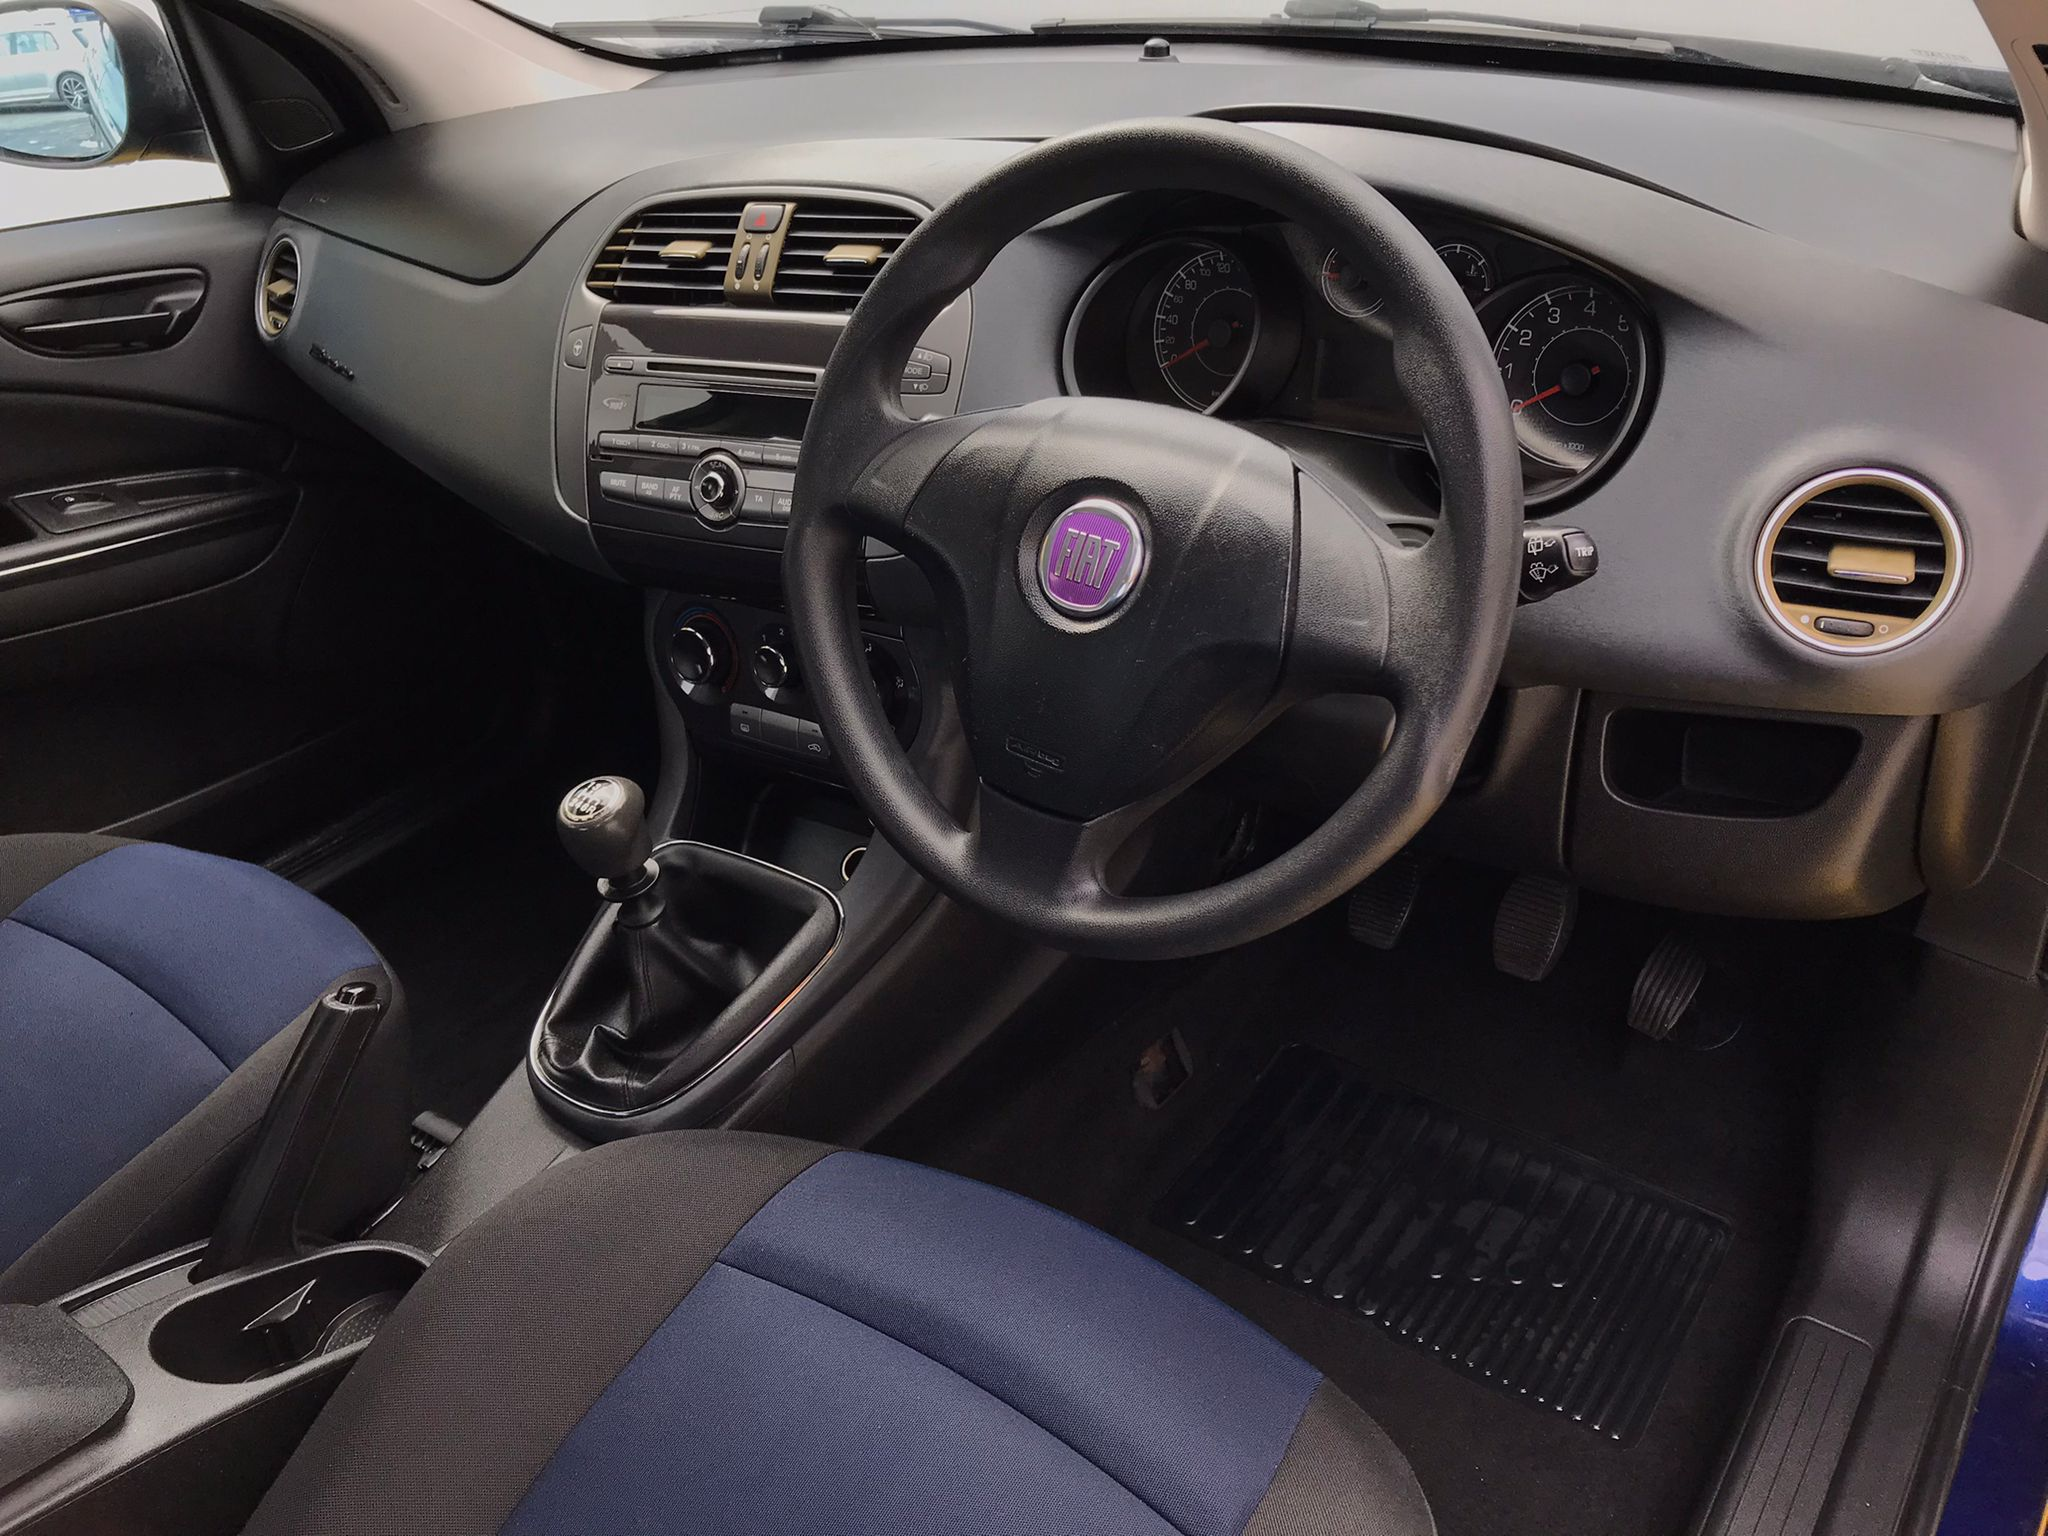 Fiat Bravo 2008 1.4